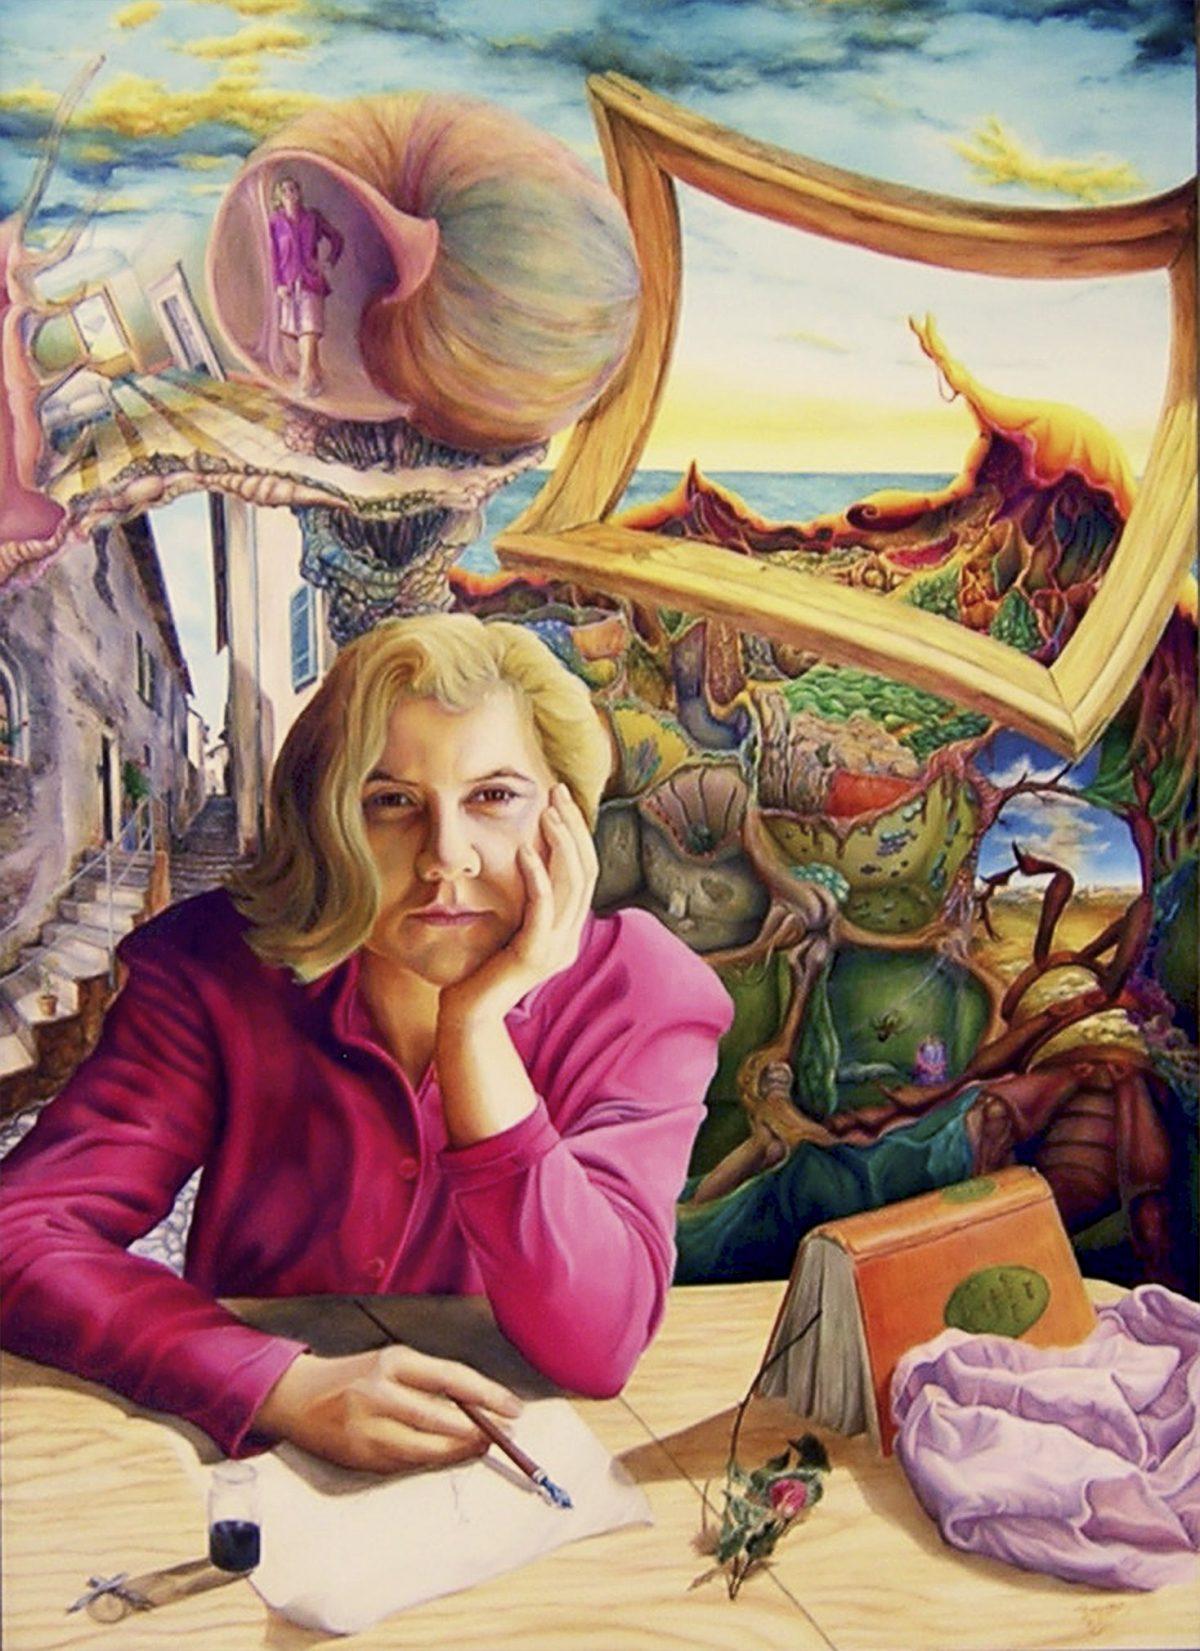 Malerei, Die Welt der Ruth - Ruth`s World, by Dagmar R. Ritter, Holzölfarbe auf Holztafel, Art On Screen [AOS] Magazine